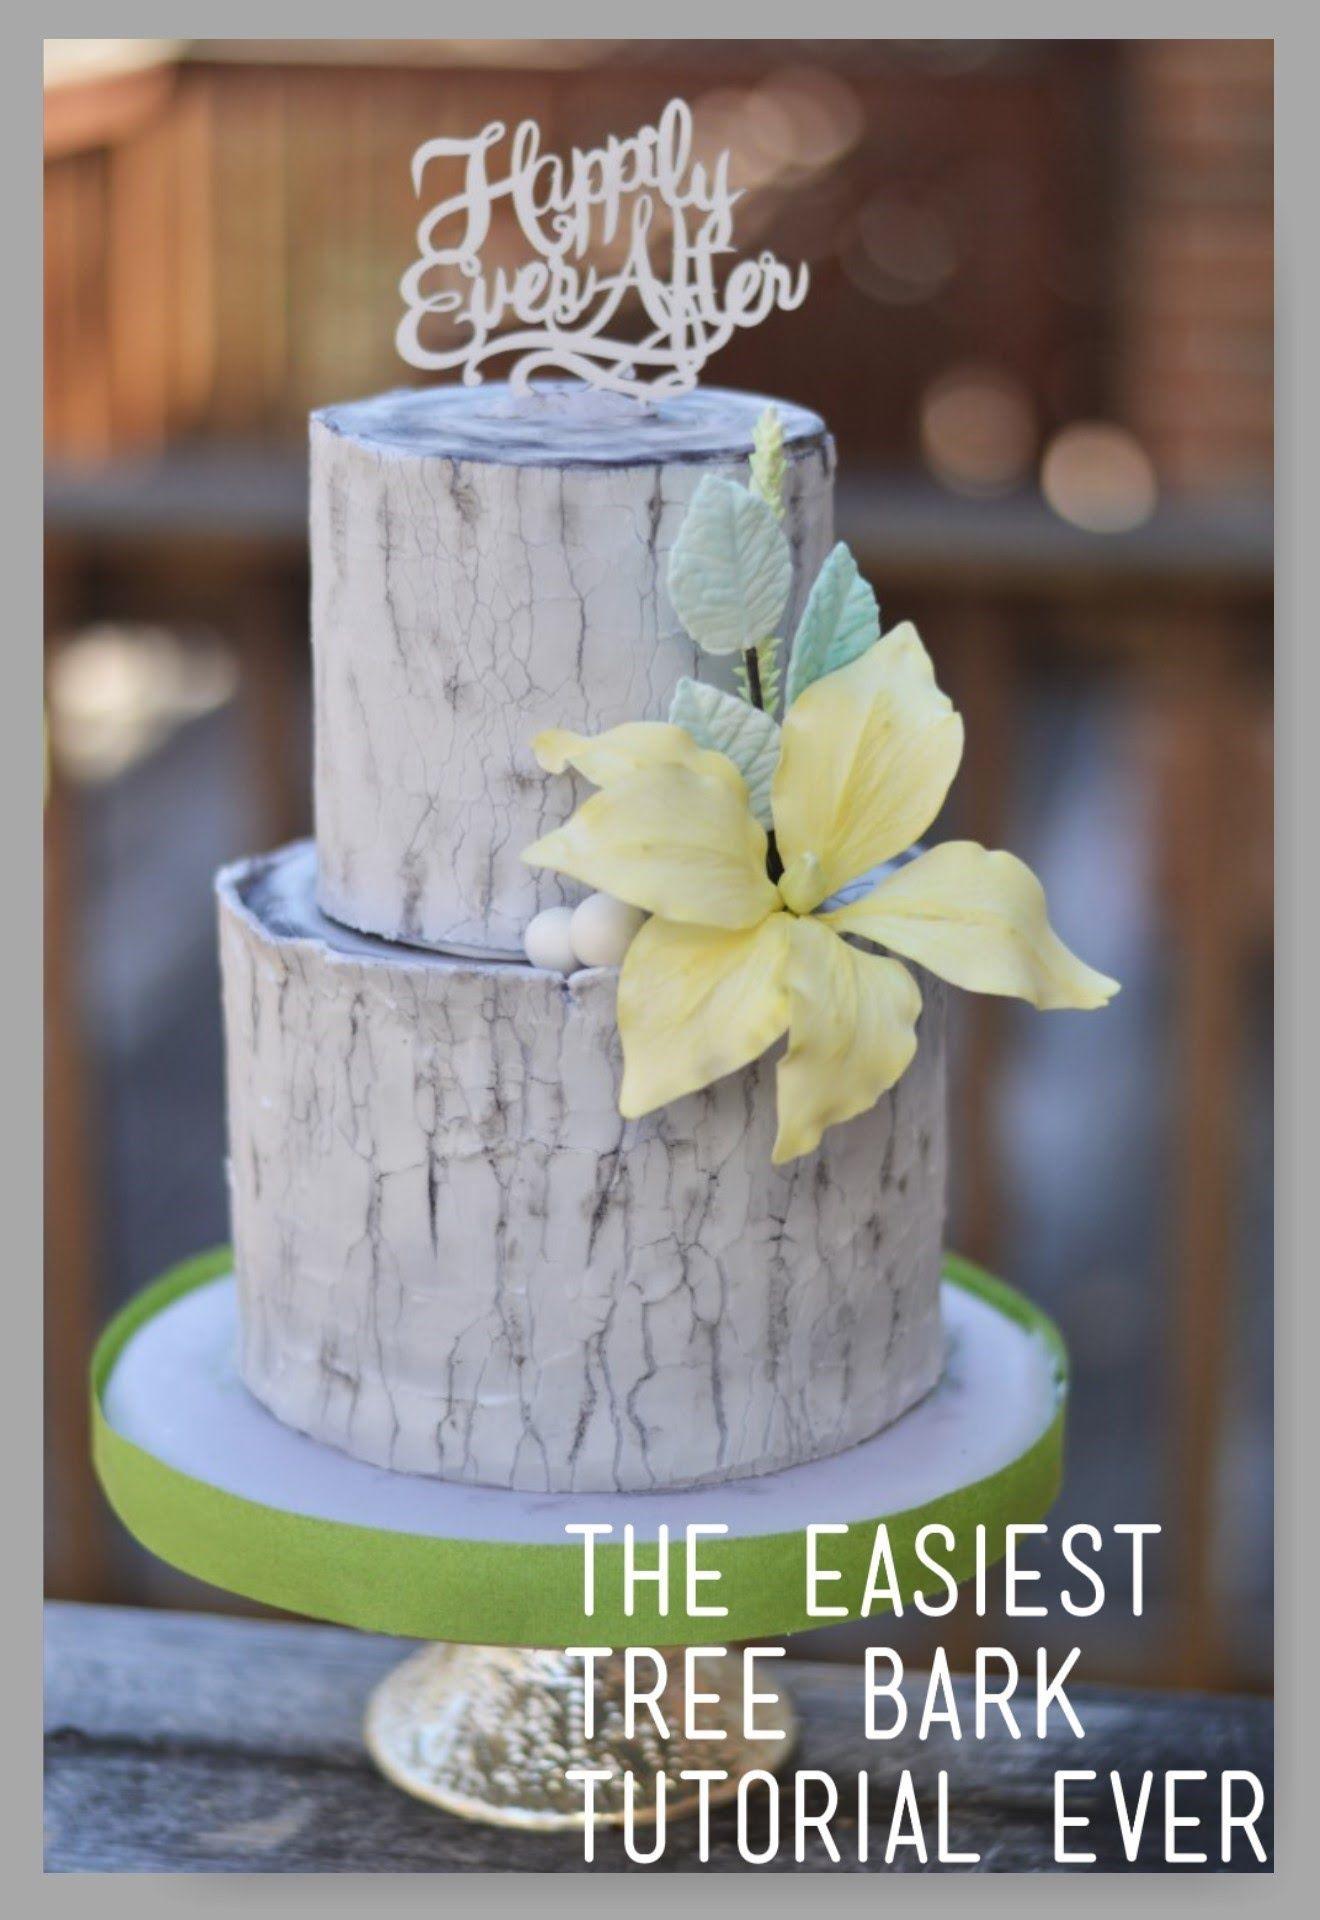 Tree Bark Tutorial How To Videos All Abt Baking Pinterest - Wedding Cake Tree Bark